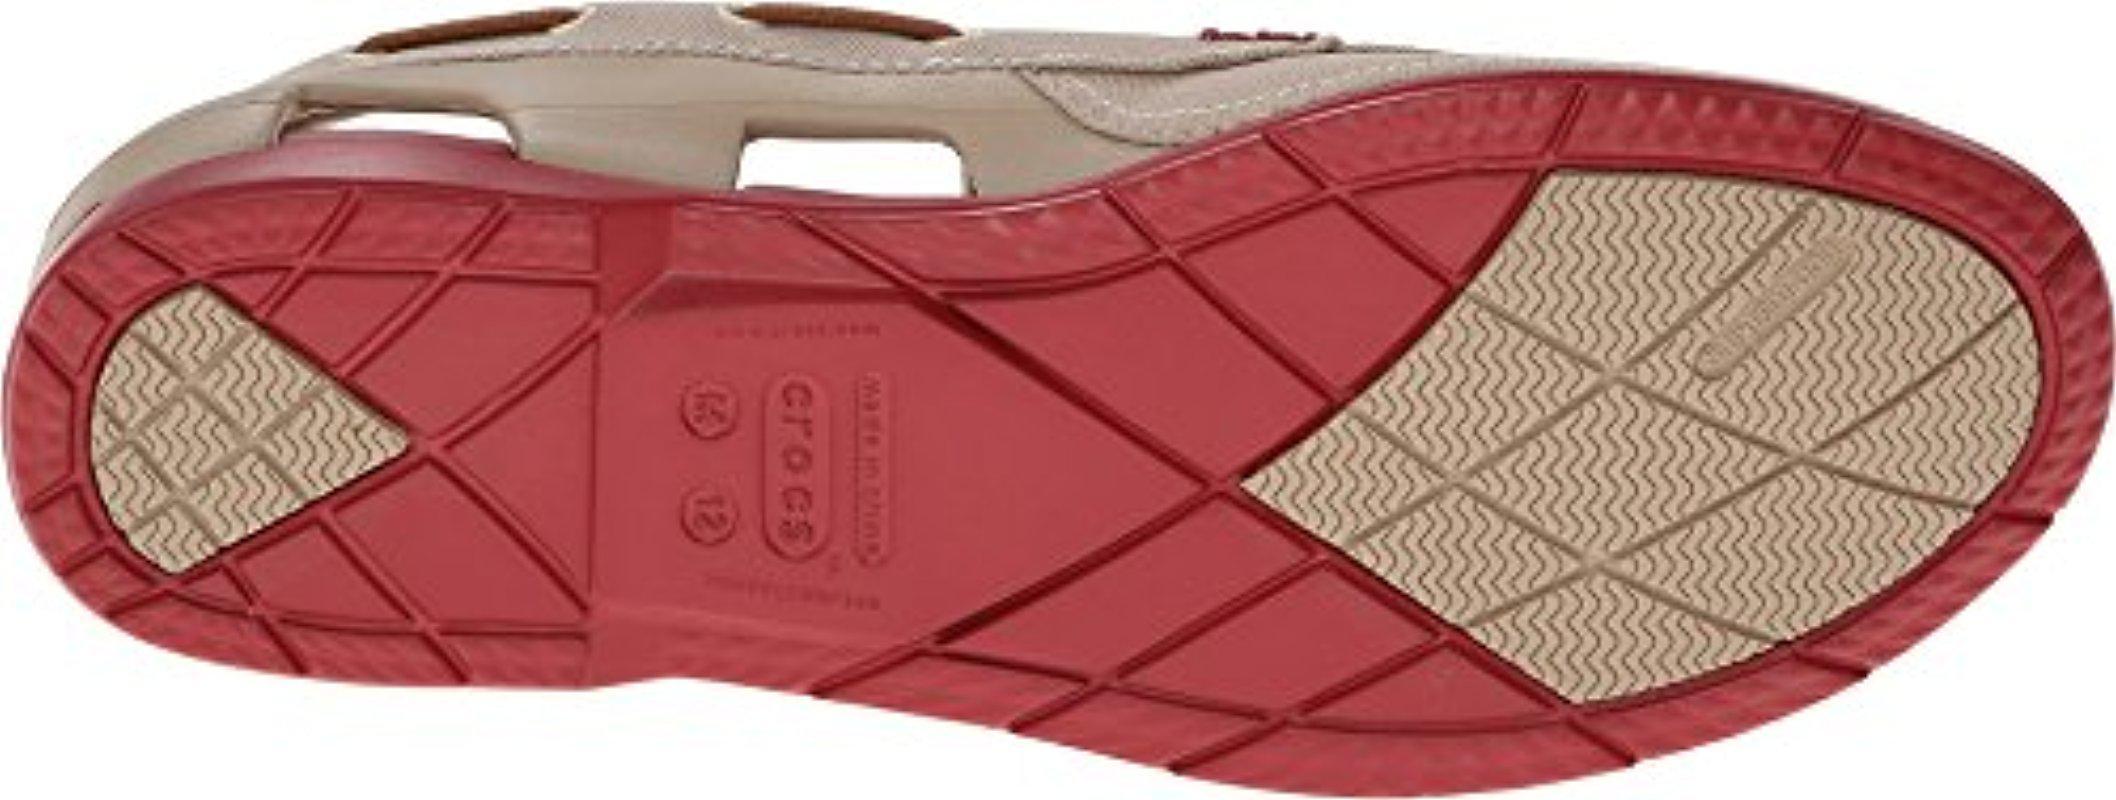 6f891a6fb Lyst - Crocs™ Beach Line Boat Shoe for Men